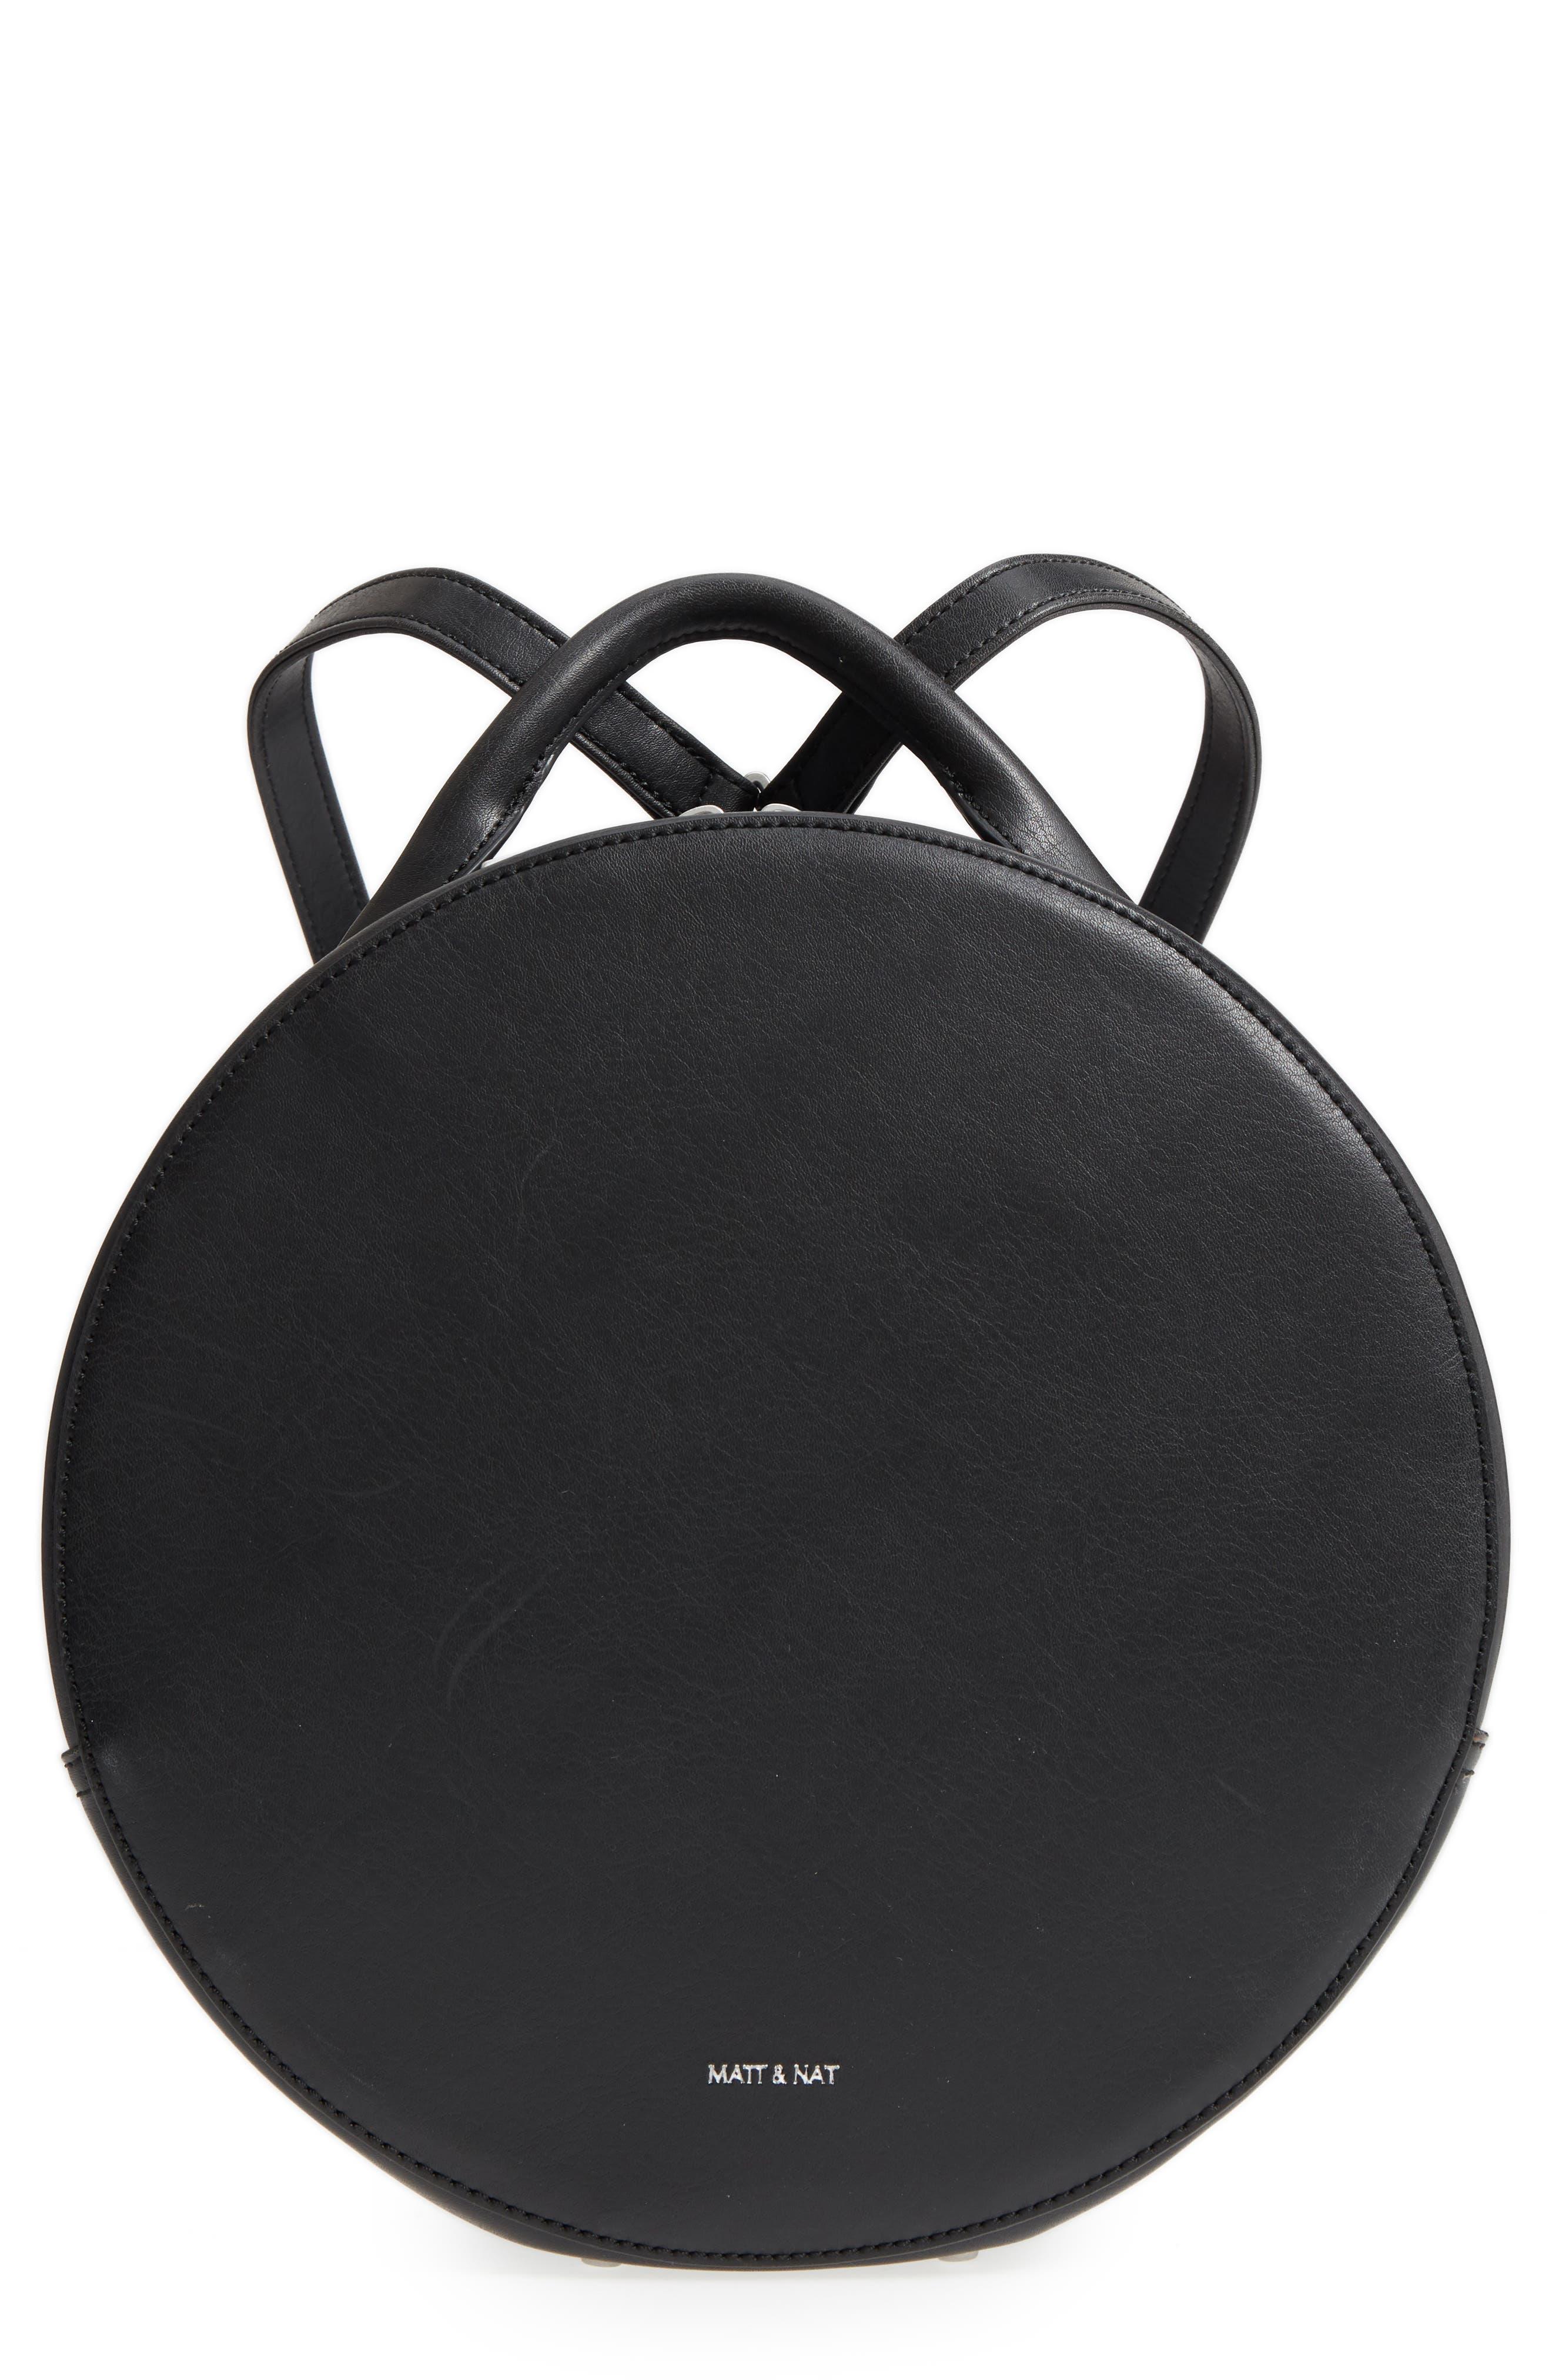 MATT & NAT,                             Kiara Faux Leather Circle Backpack,                             Main thumbnail 1, color,                             BLACK